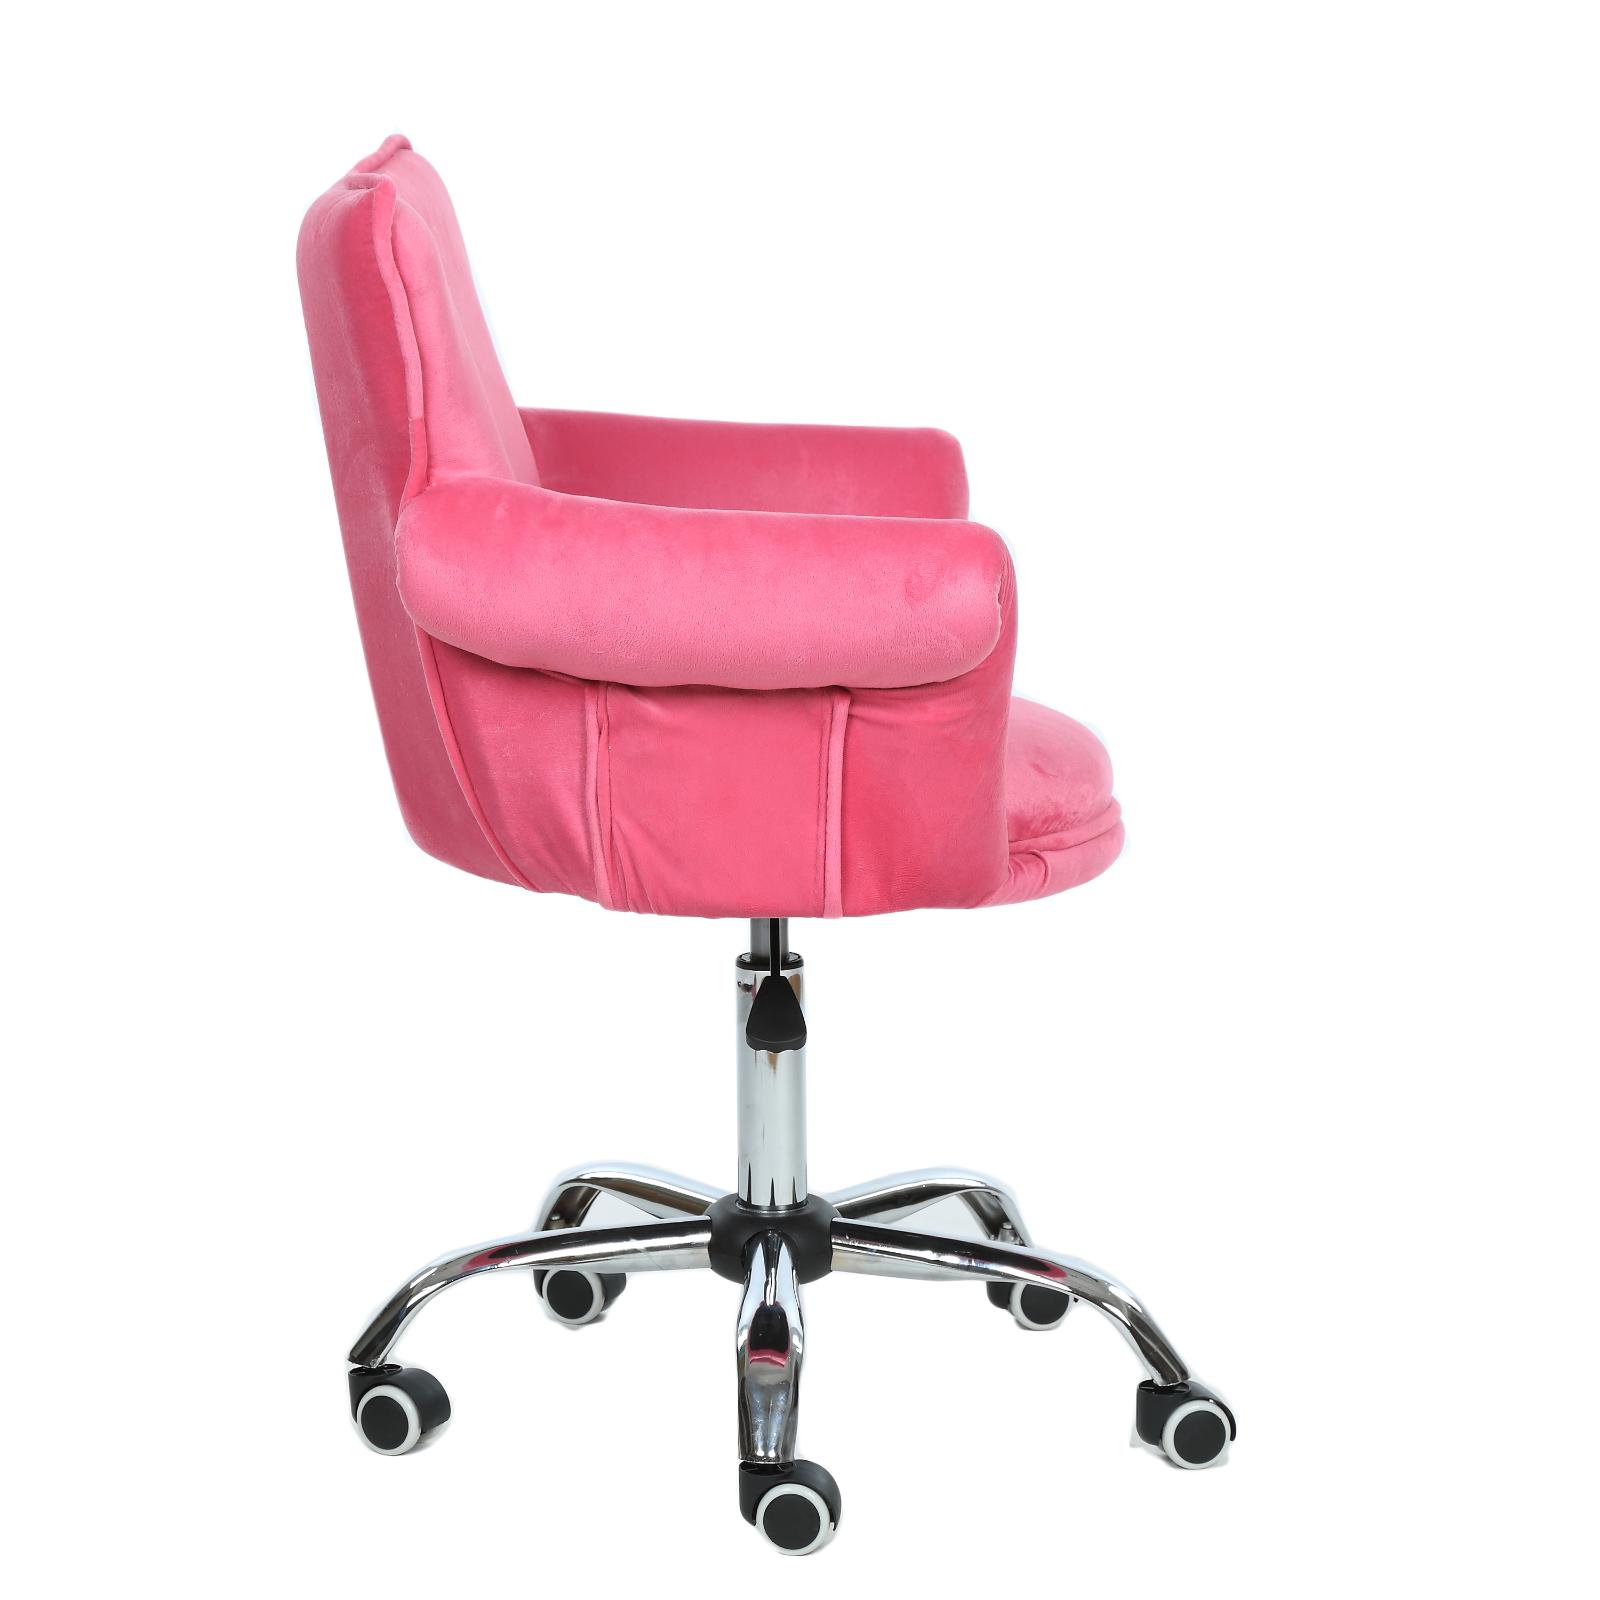 Microfiber Beauty Nail Salon Chair Bar Stool Spa Vanity